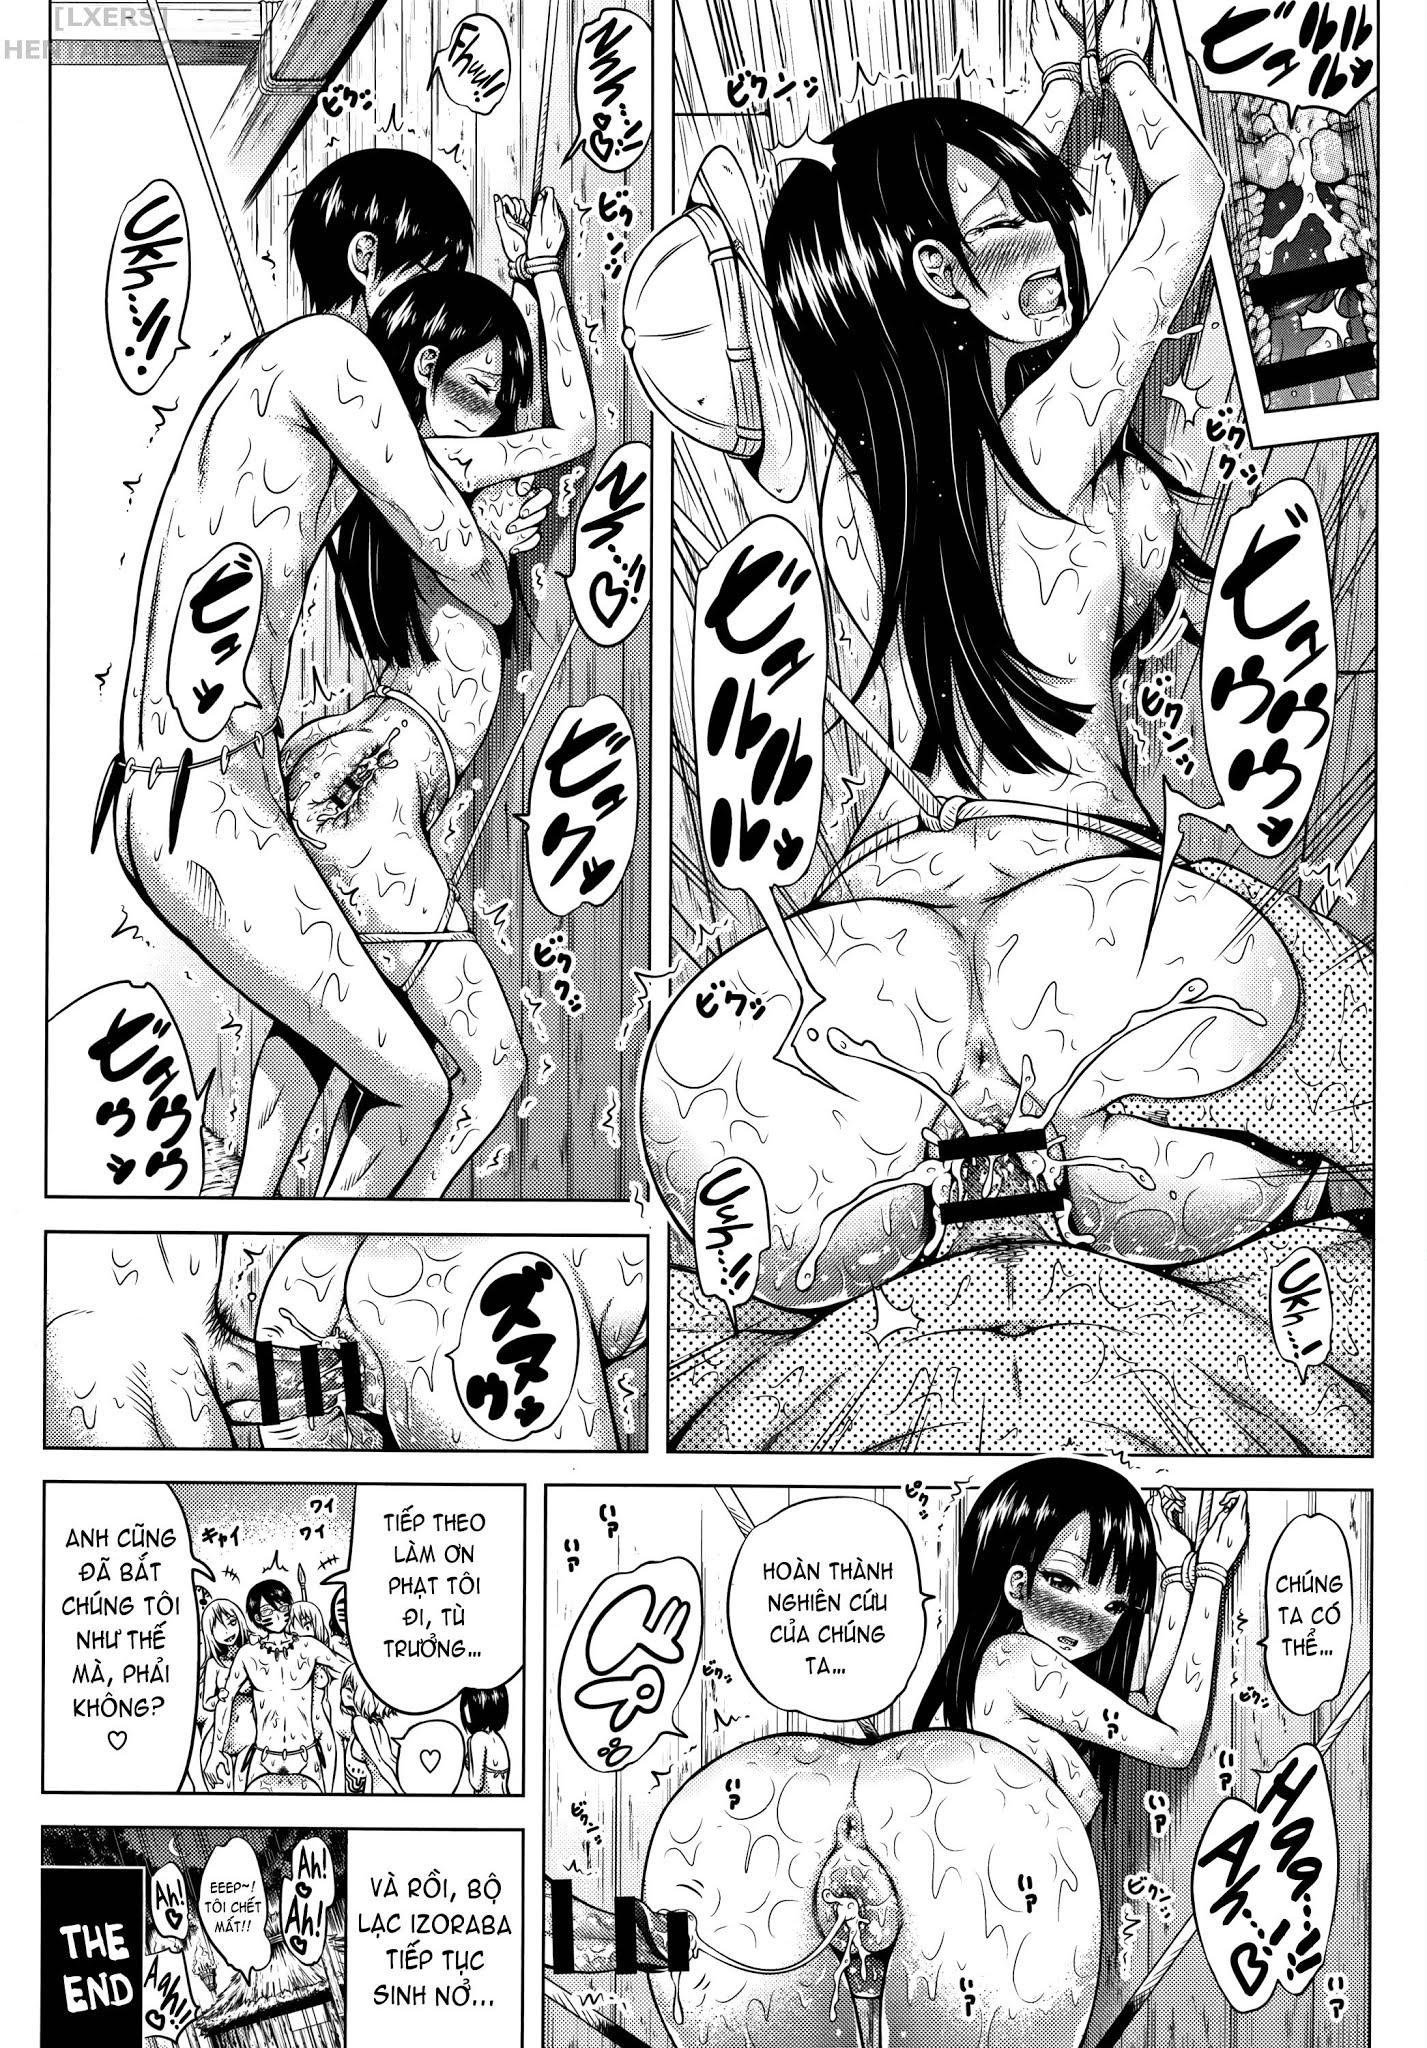 biribiri_Lovemare_227%2Bcopy Lovemare Jou  - hentaicube.net - Truyện tranh hentai online